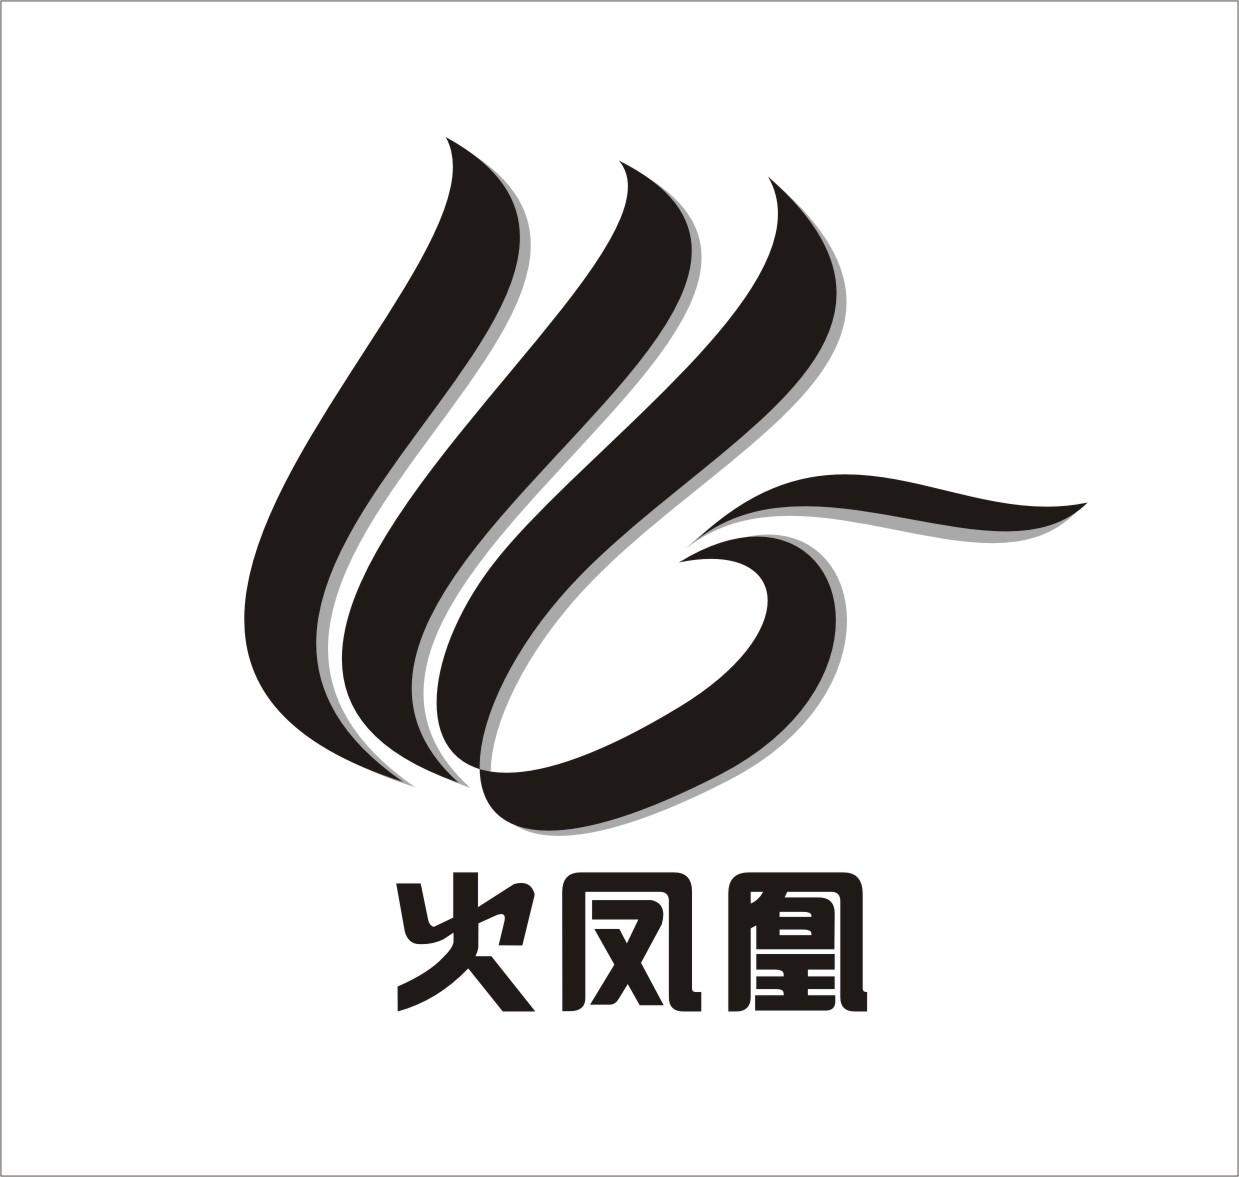 logo logo 标志 设计 图标 1239_1177